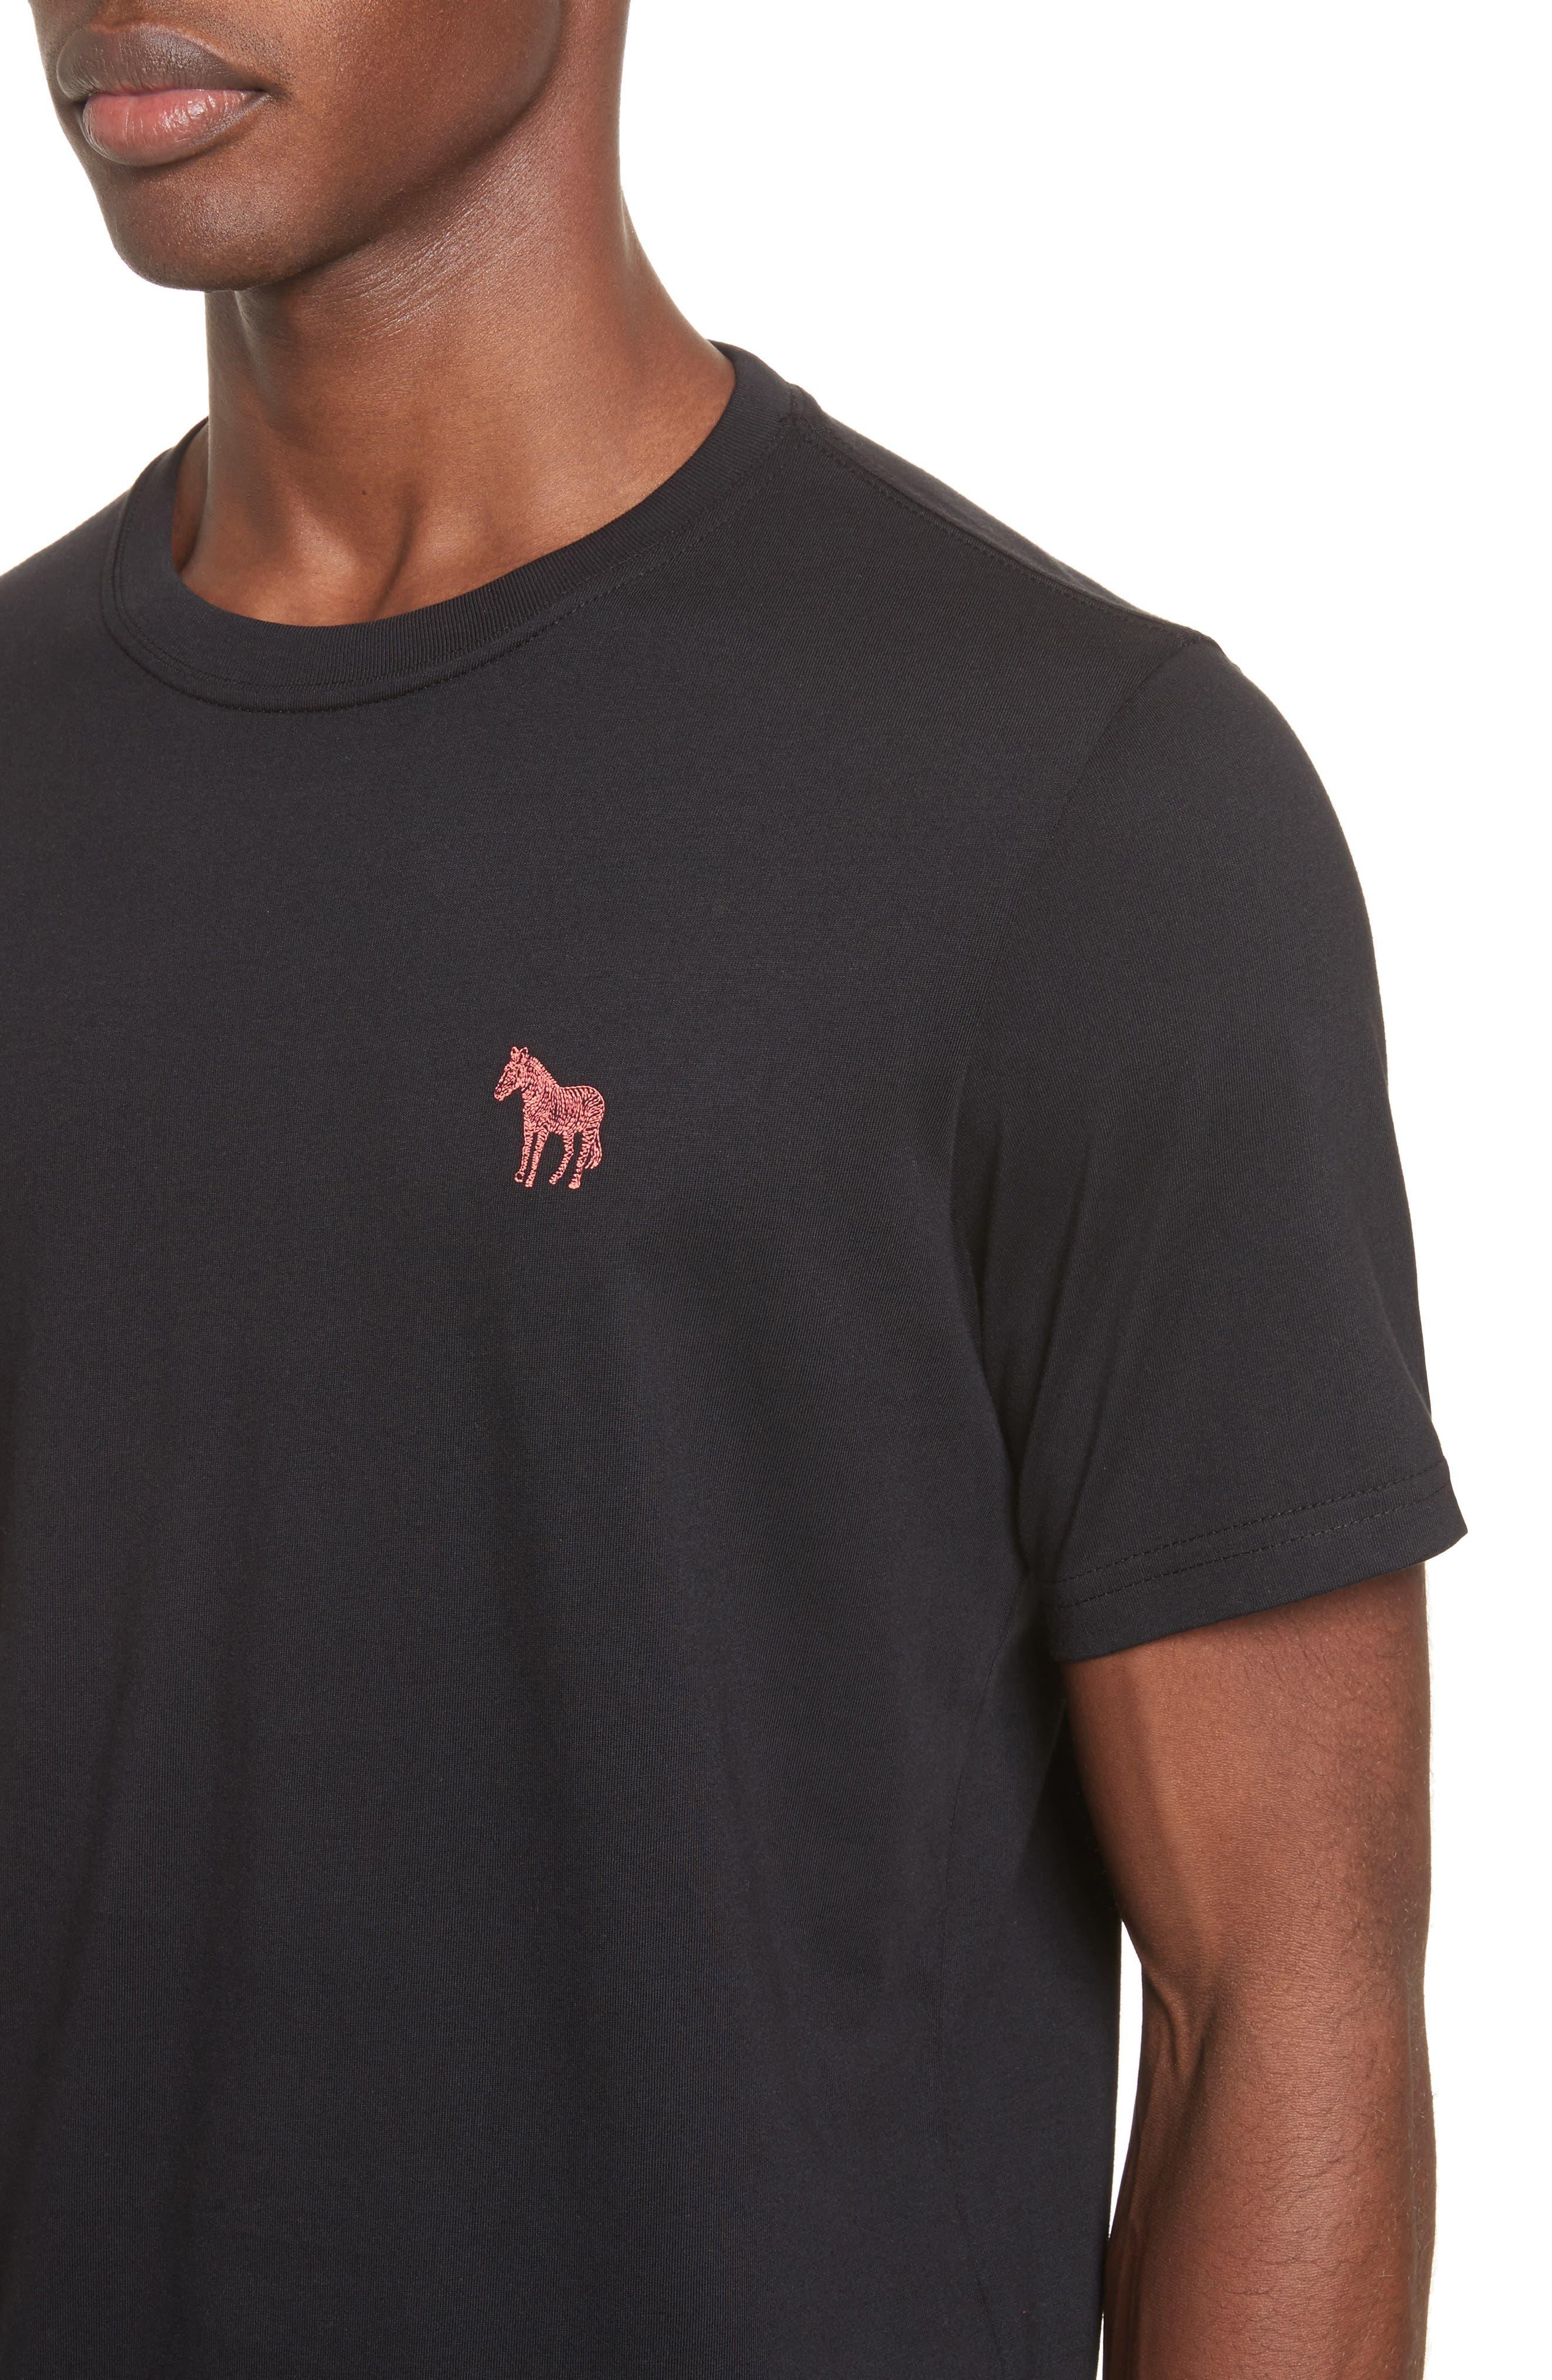 Embroidered Zebra T-Shirt,                             Alternate thumbnail 4, color,                             Black